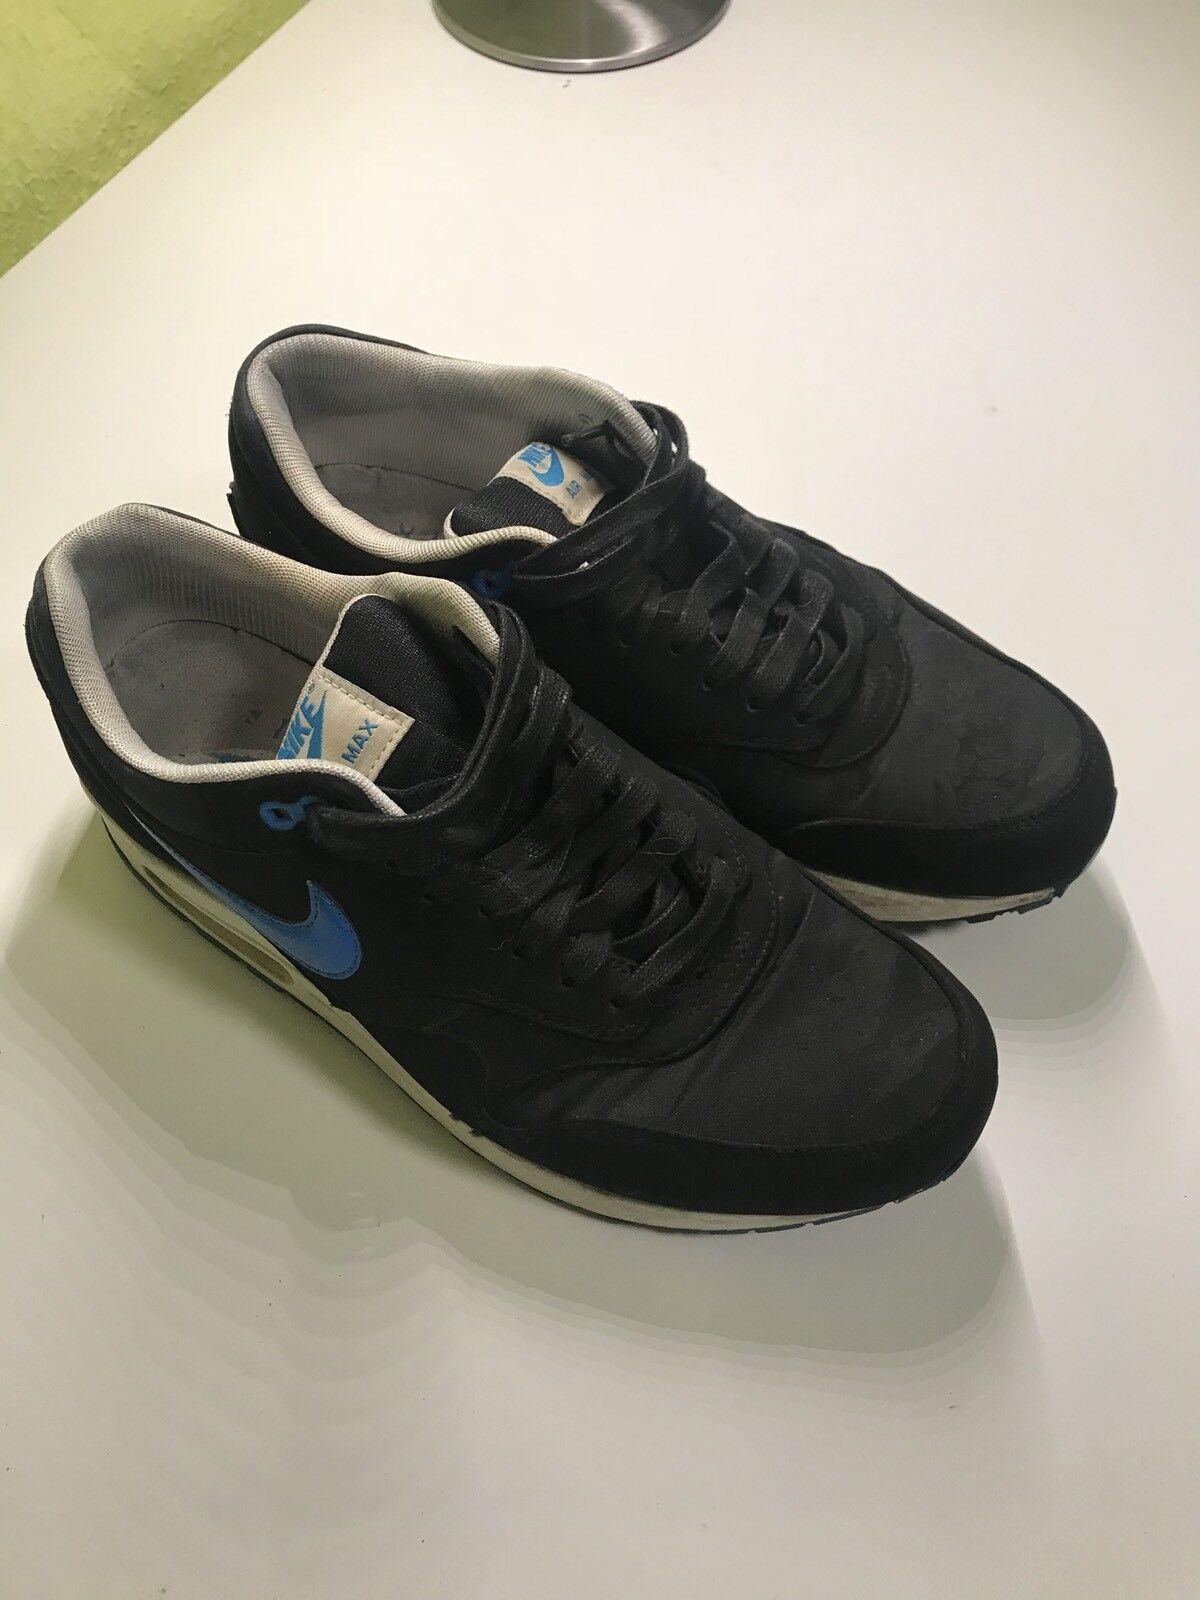 Billig gute Qualität Nike Air Max